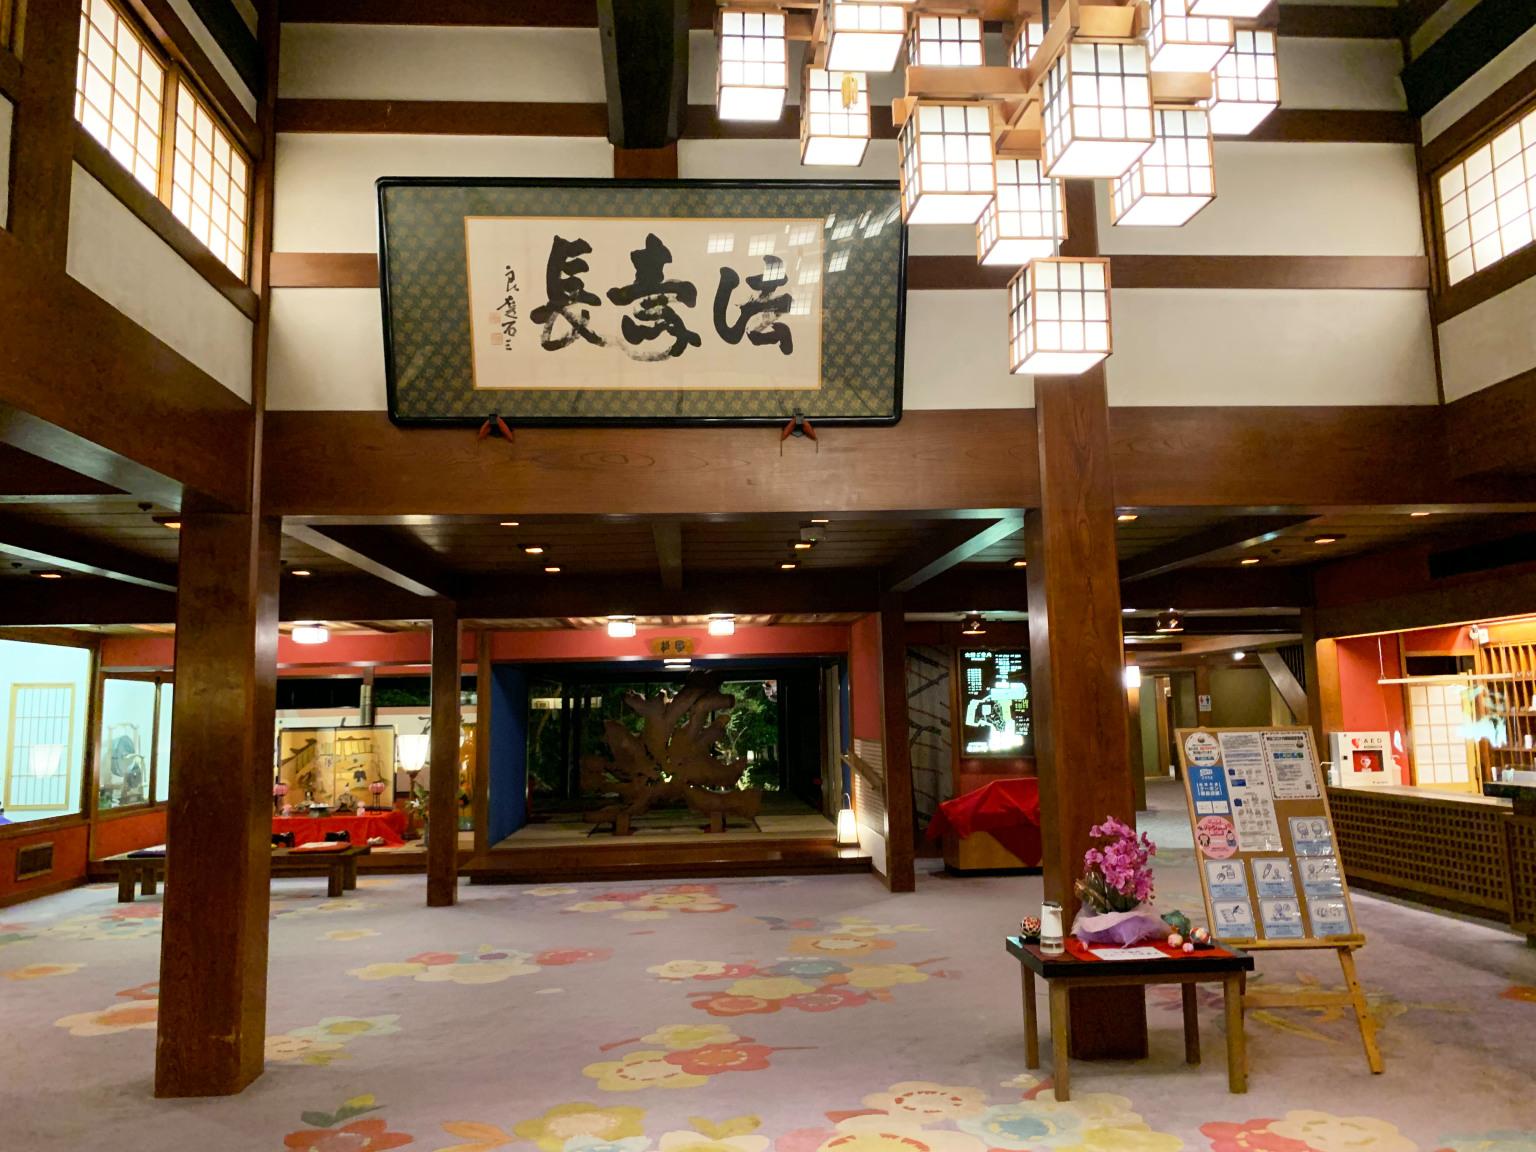 Houshi-Ryokan-onsen-hotel-oldest-in-world-Japan-business-travel-Hoshi-accommodation-stay-photos-reviews-Ishikawa-3.jpg